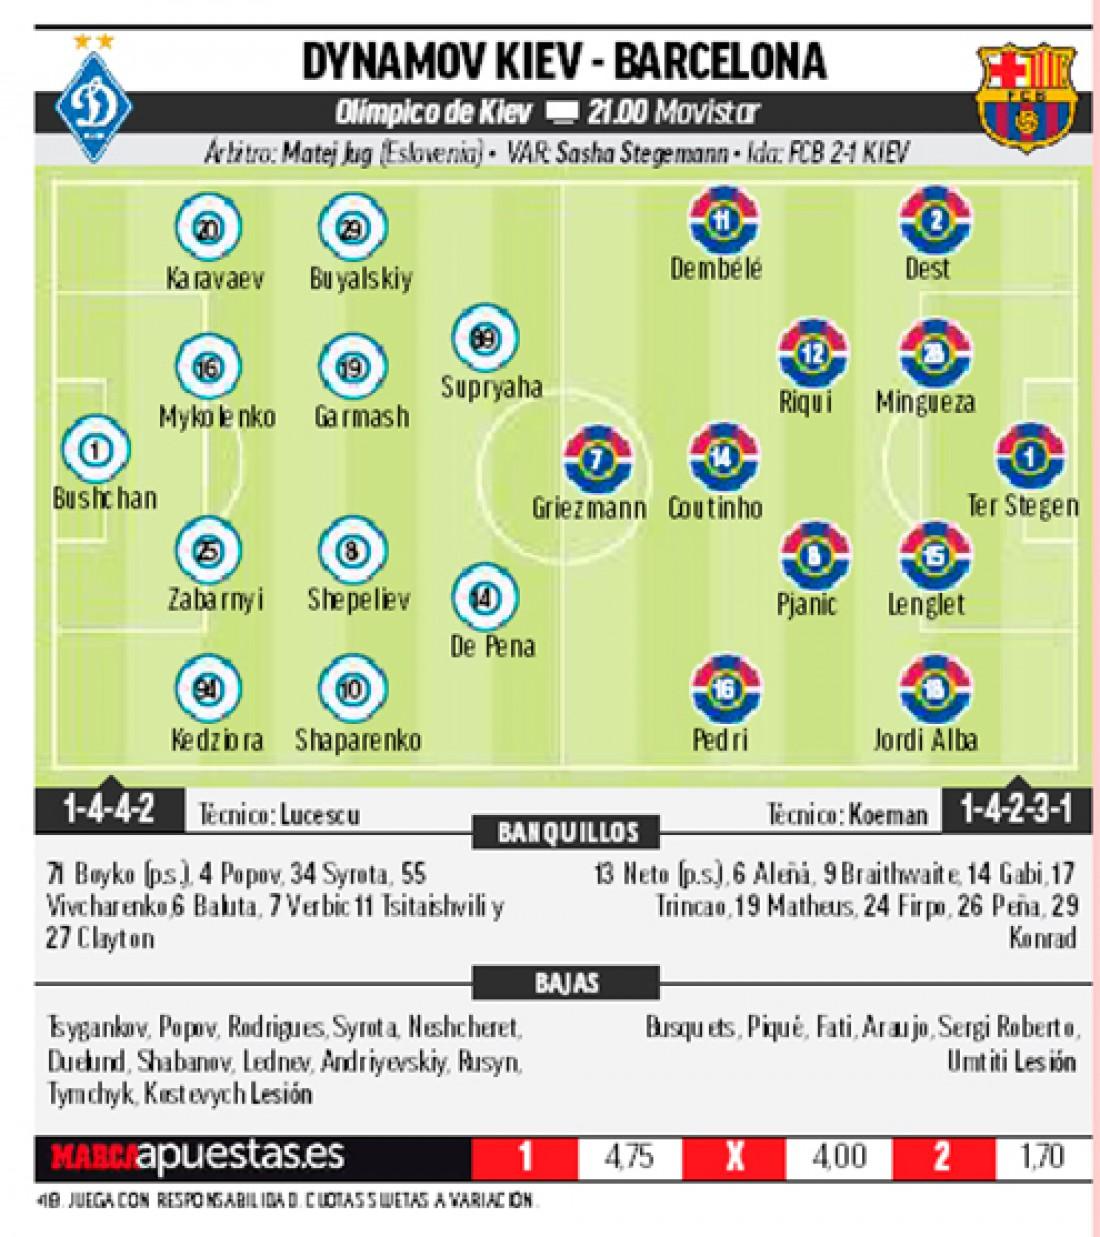 Расстановка на матч Динамо - Барселона по версии Marca